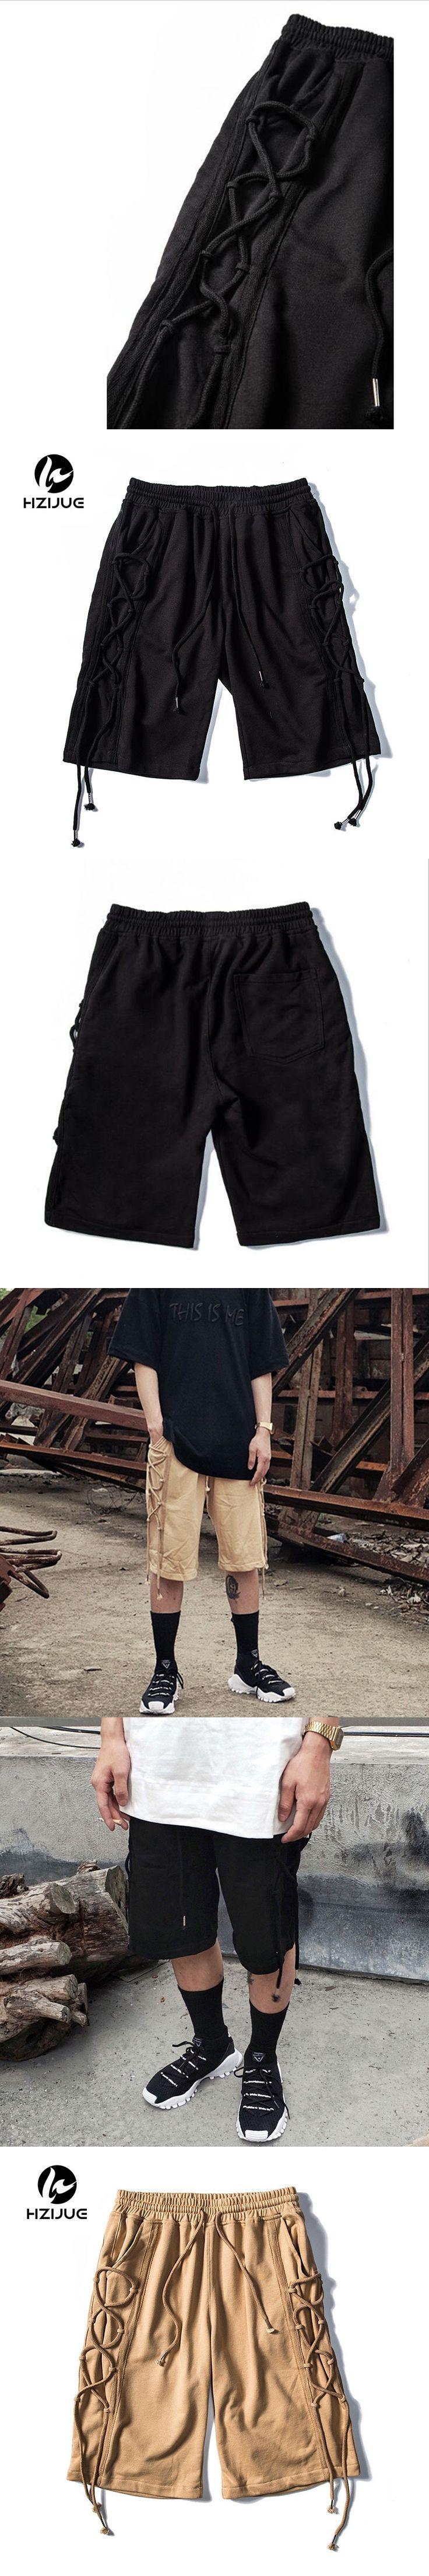 HZIJUE 2017 TOP Streetwear Summer KANYE WEST Ribbon MEN shorts HIP HOP Fashion Casual khaki black shorts justin bieber M-XL